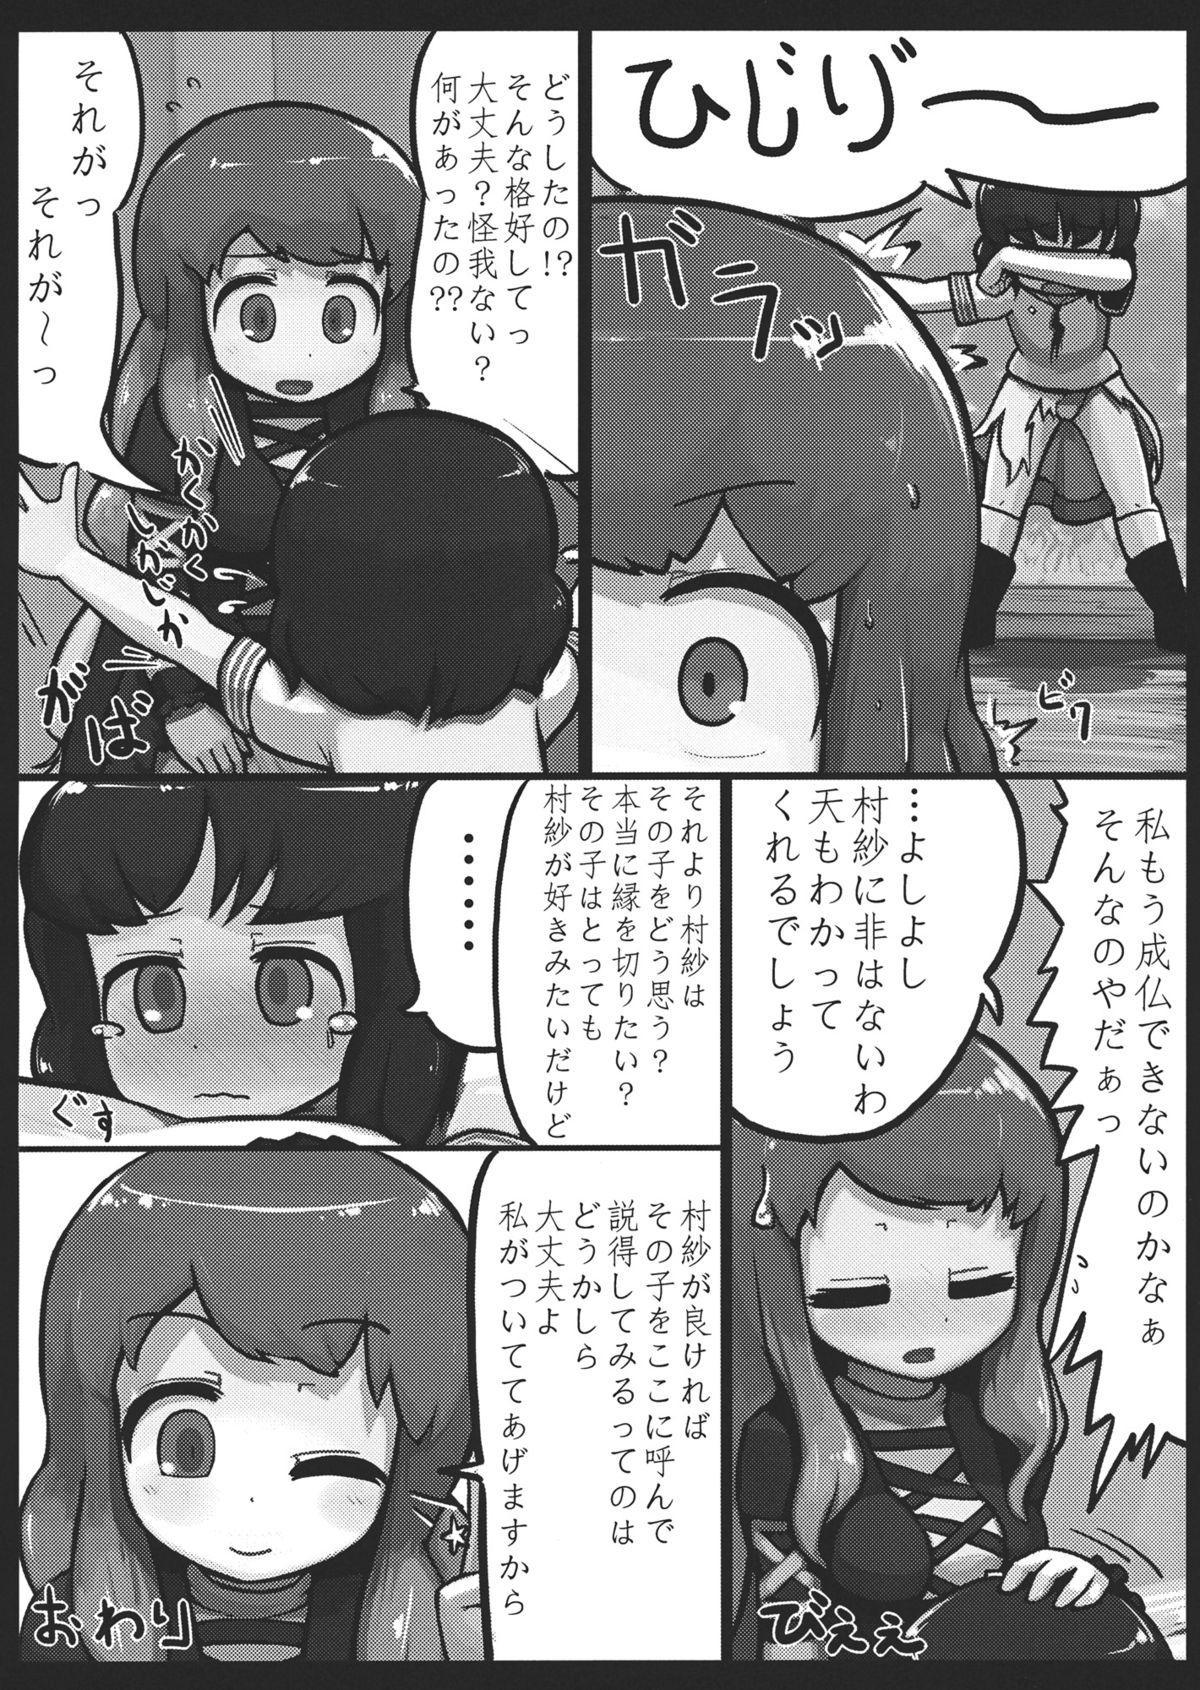 Nue x Murasa Shunga 24